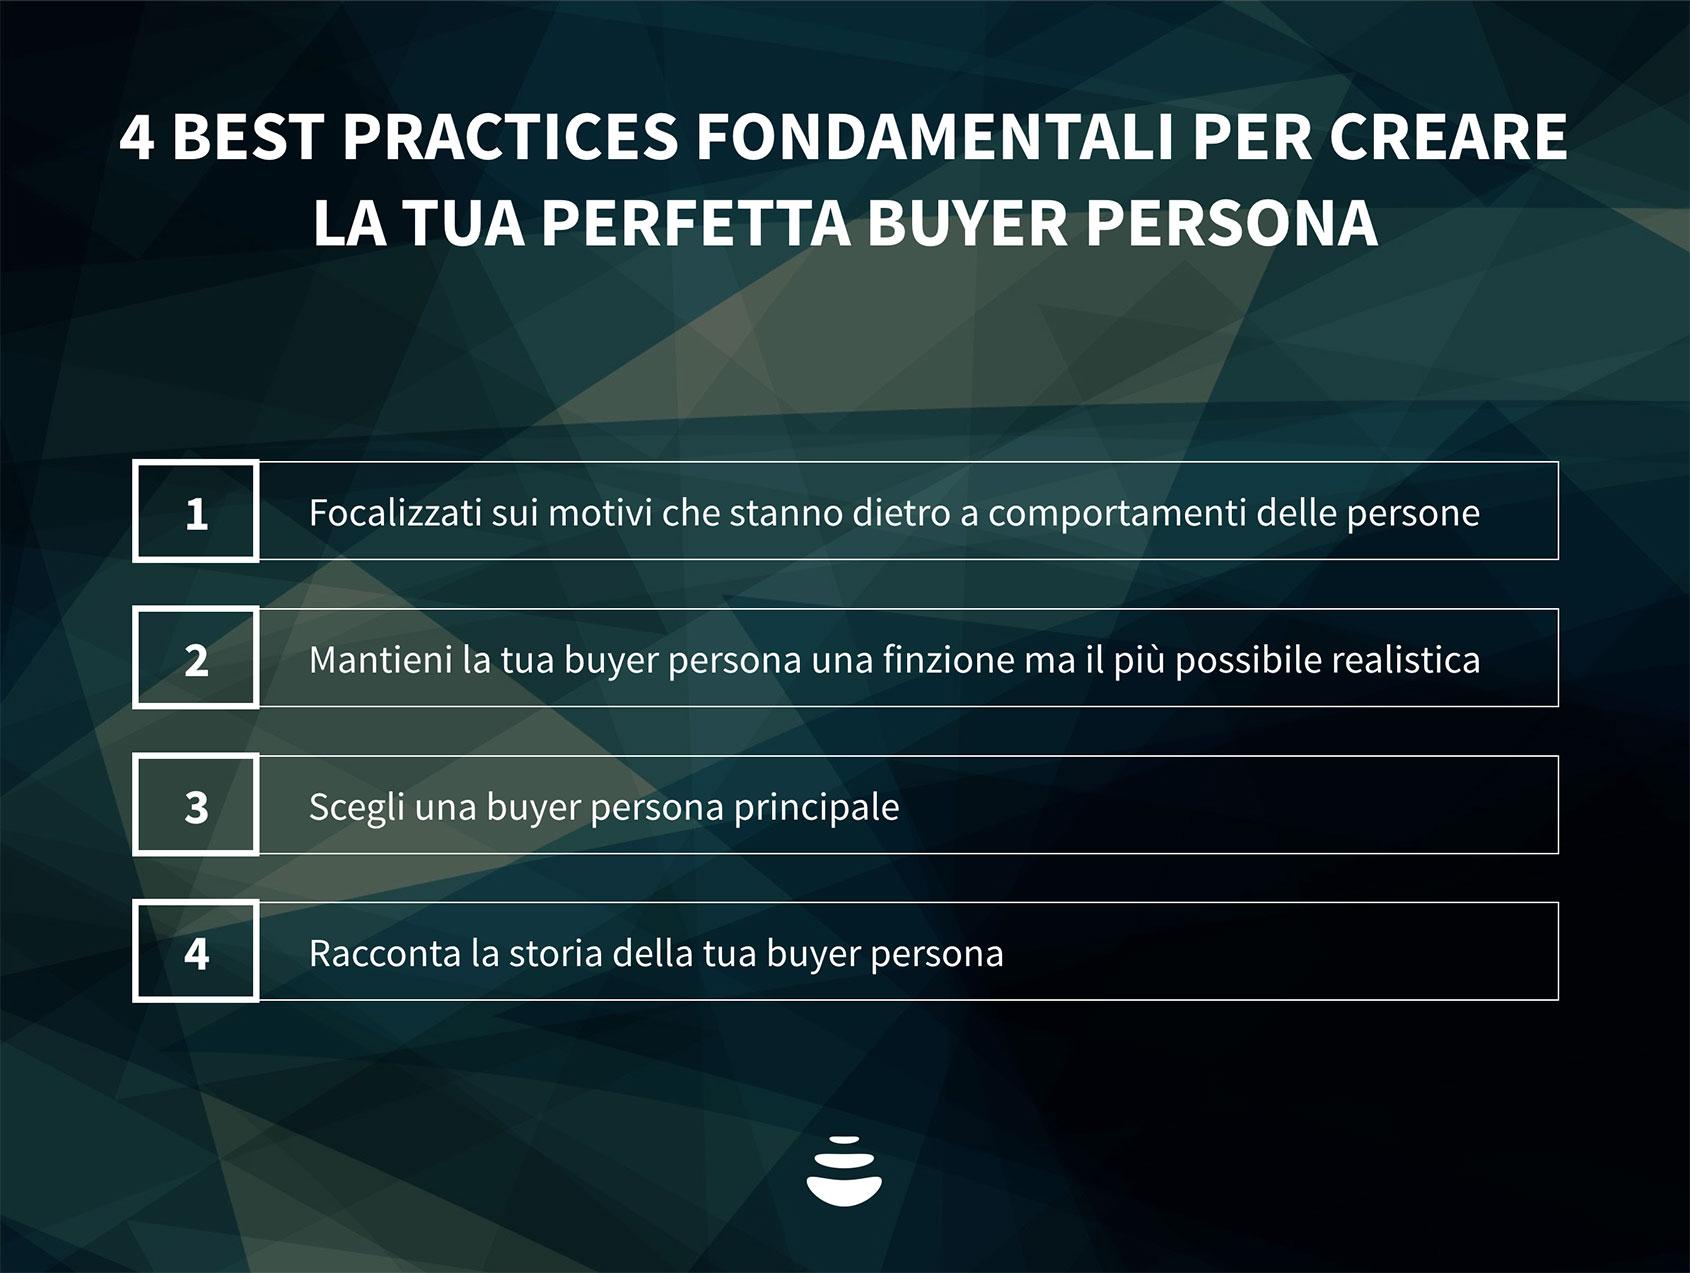 buyer-personas-advmedialab-01.jpg